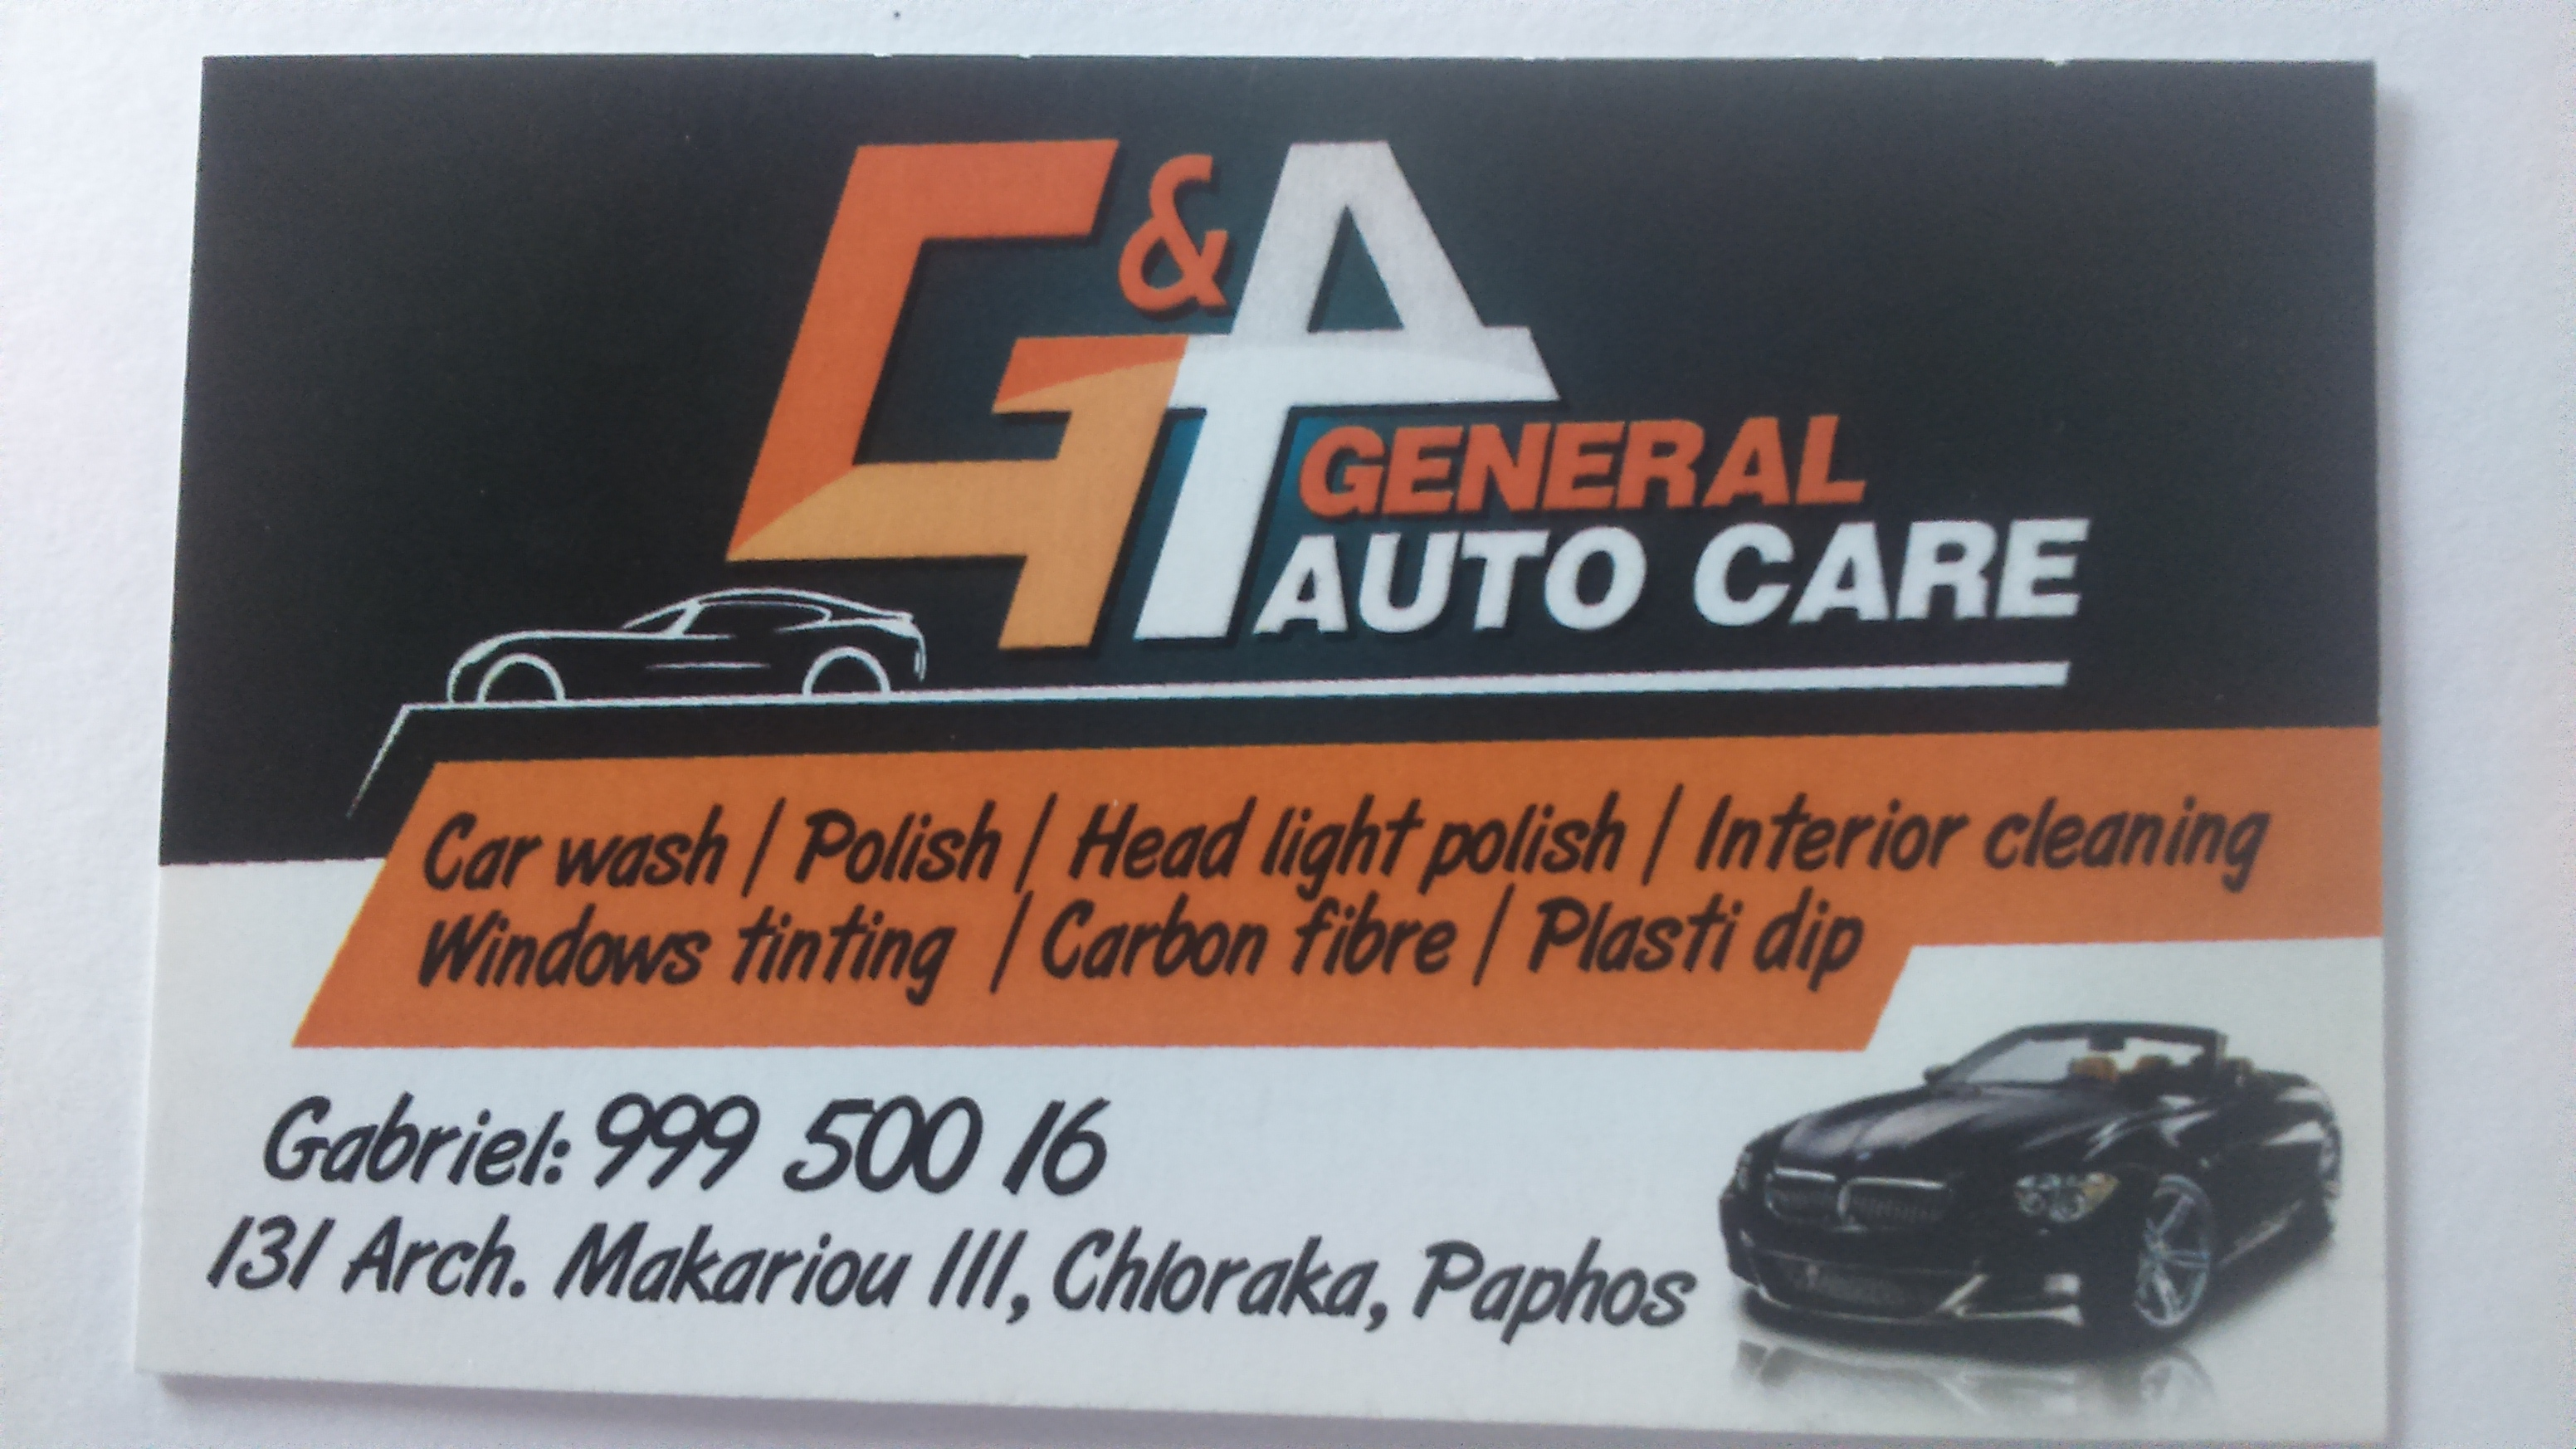 G&A General Auto Care